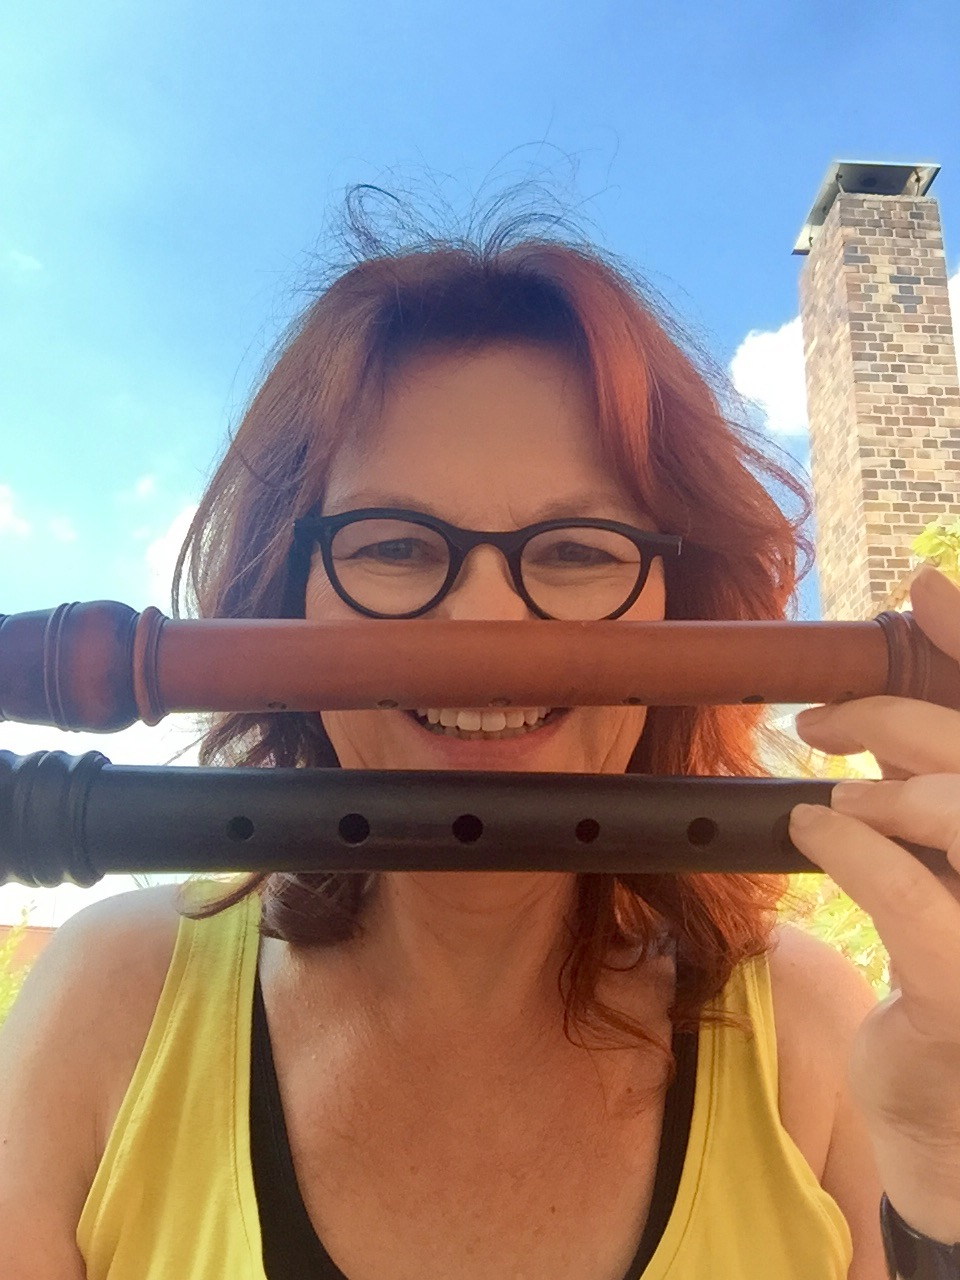 Musikunterricht; Musikinstituit MusiCeum; Blockflöen; musikpädagogische Beratung; Musiklehrer